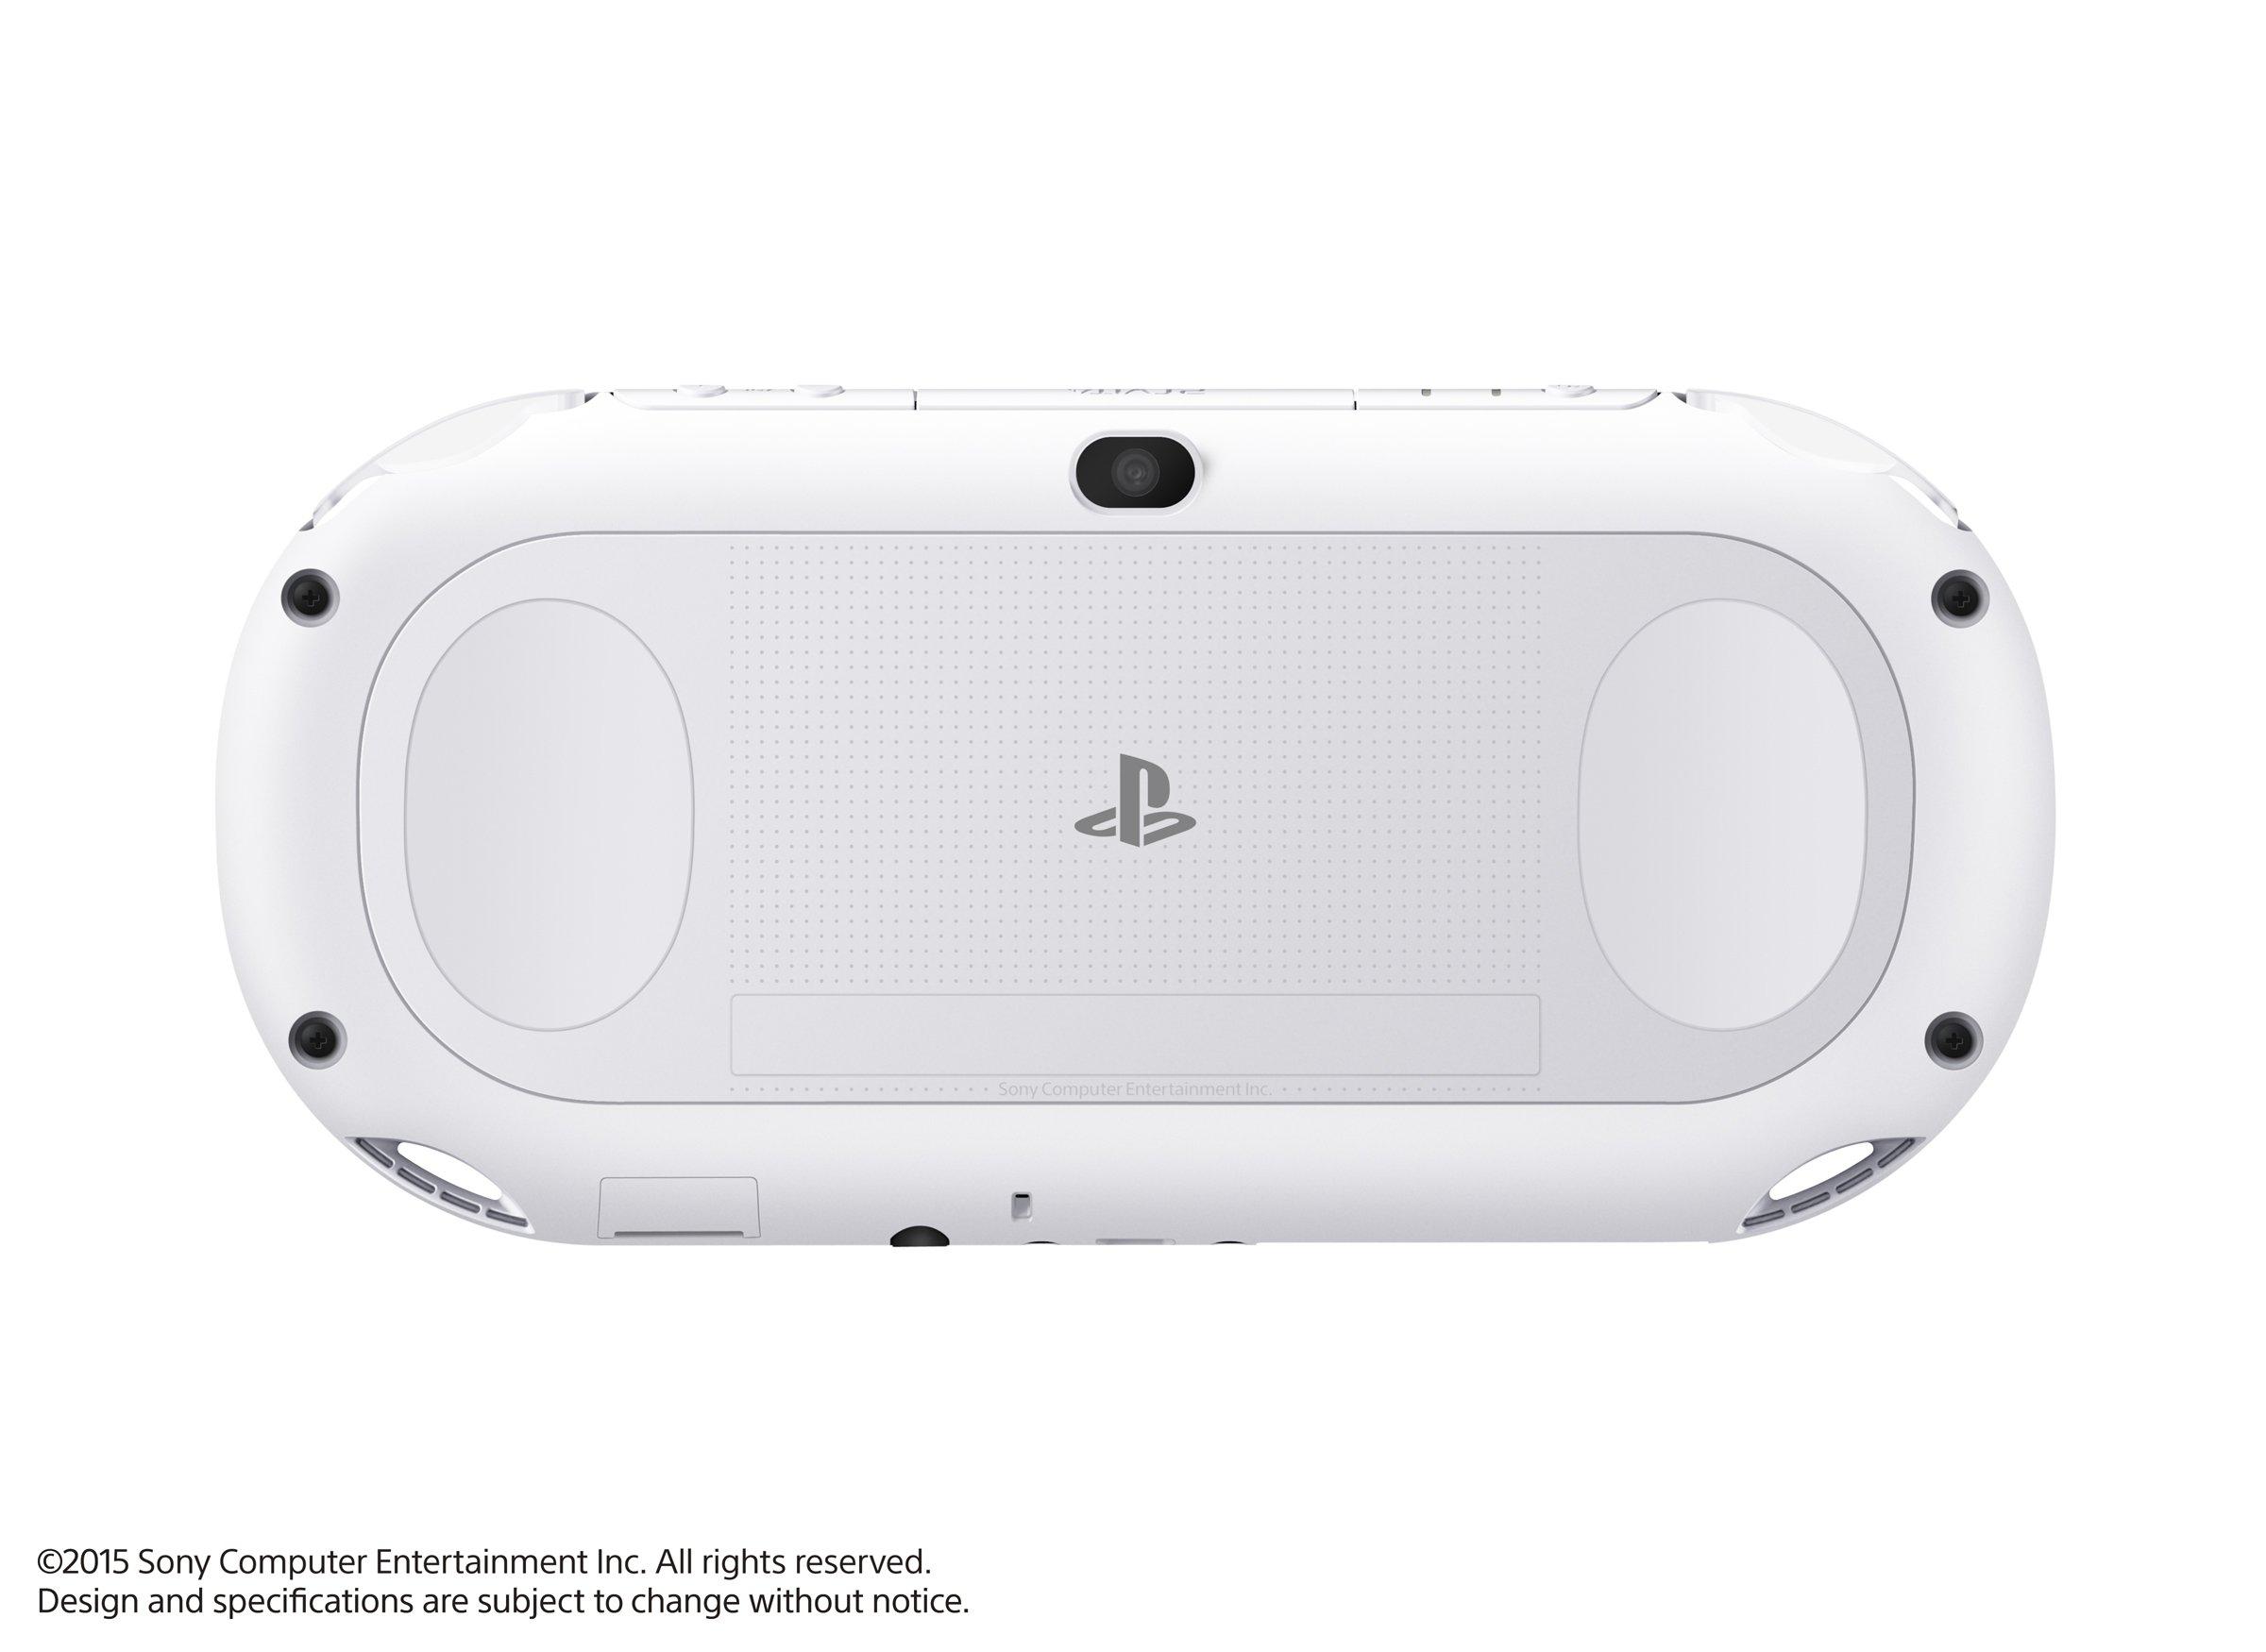 PlayStation Vita Wi-Fi model Glacier White (PCH-2000ZA22) Japanese Ver. Japan Import by Sony (Image #4)